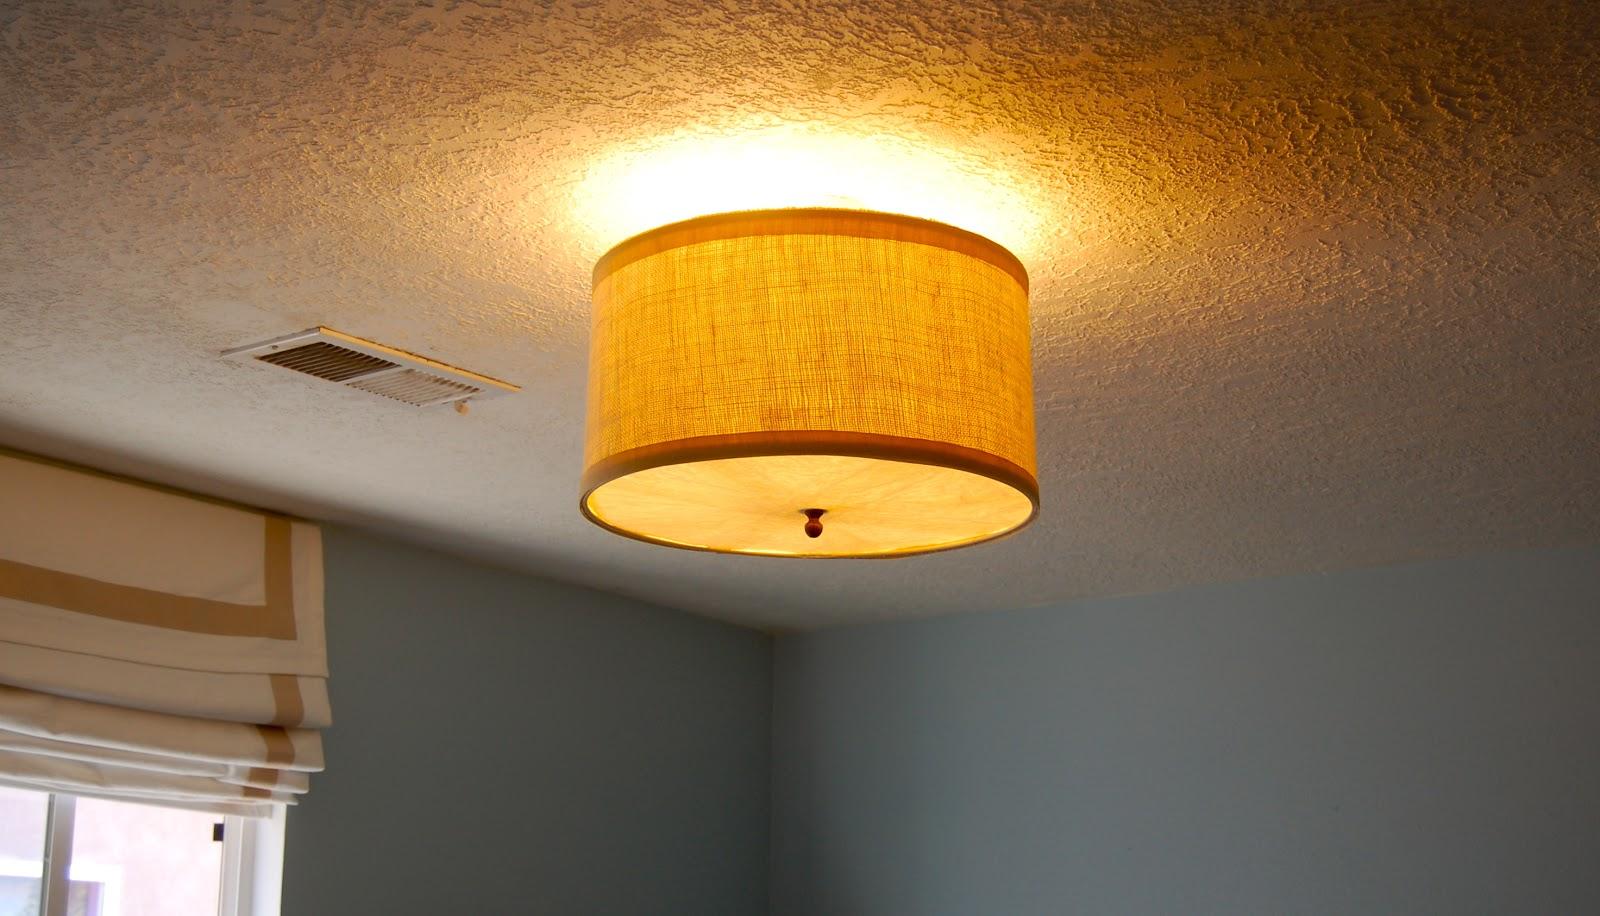 Diy Ceiling Light Cover Designs